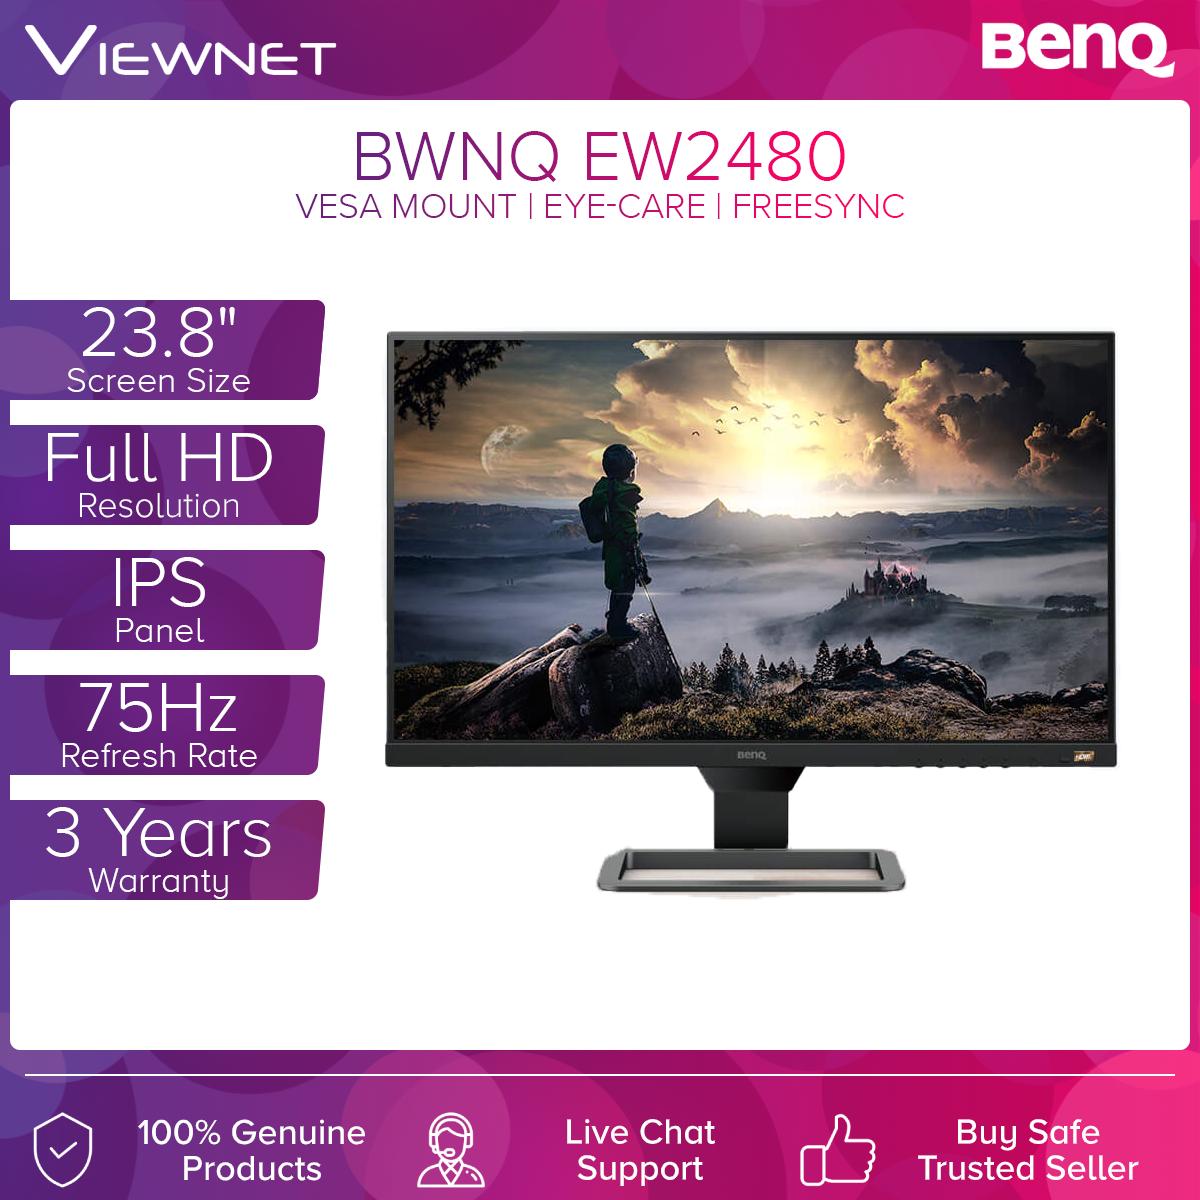 BenQ EW2480 24 inch HDRi Screen Auto-adjustment Tech Eye Care Monitor